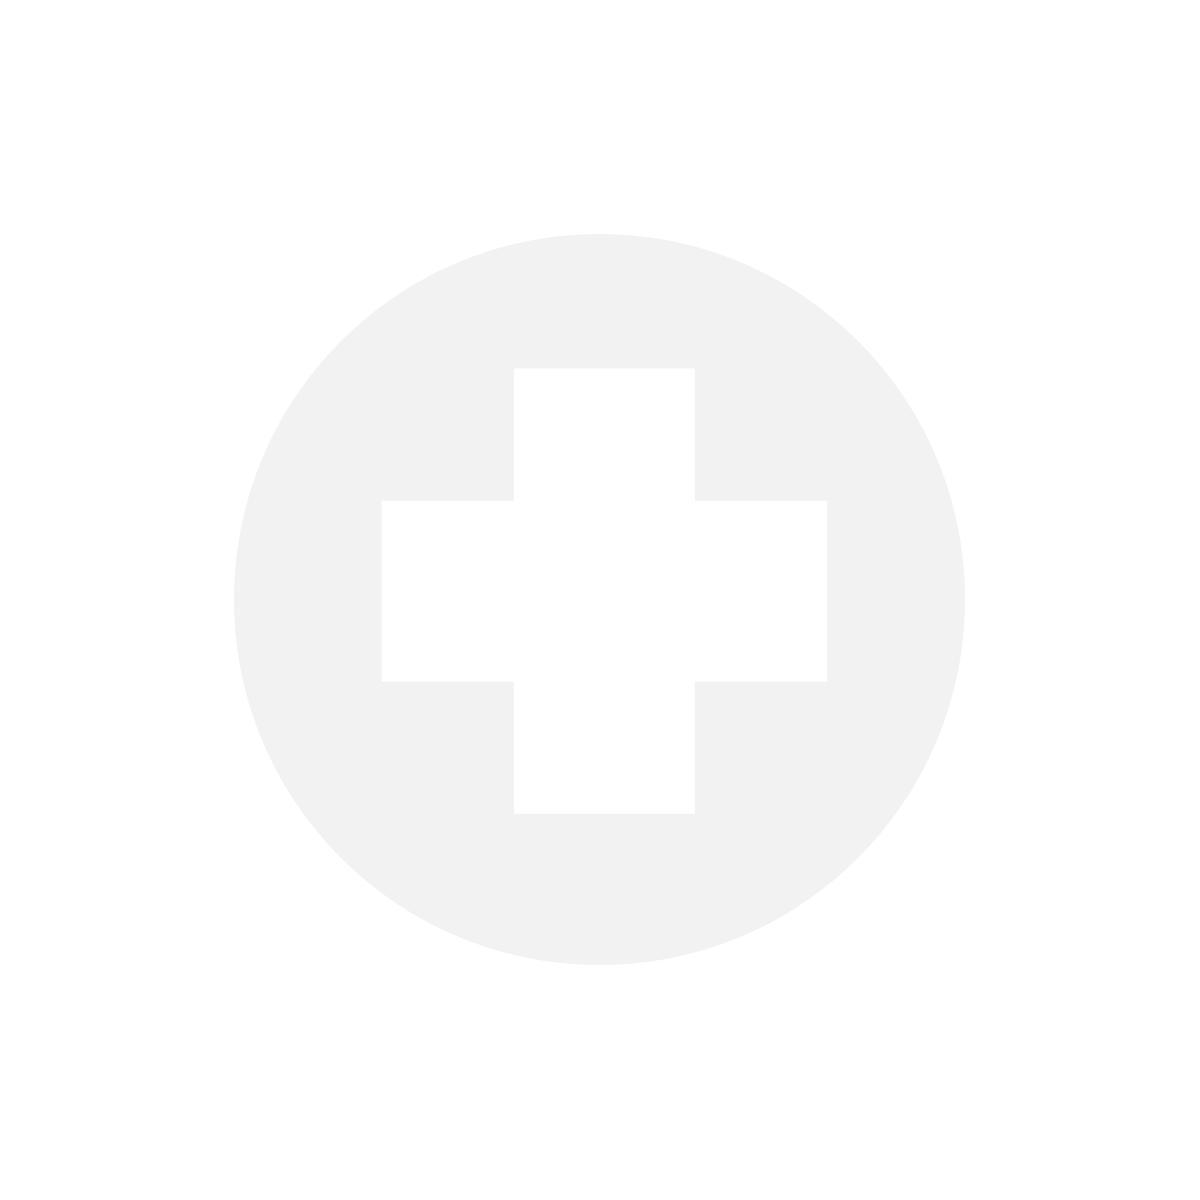 SIDLYNE NEUTRE F Etoile Médicale